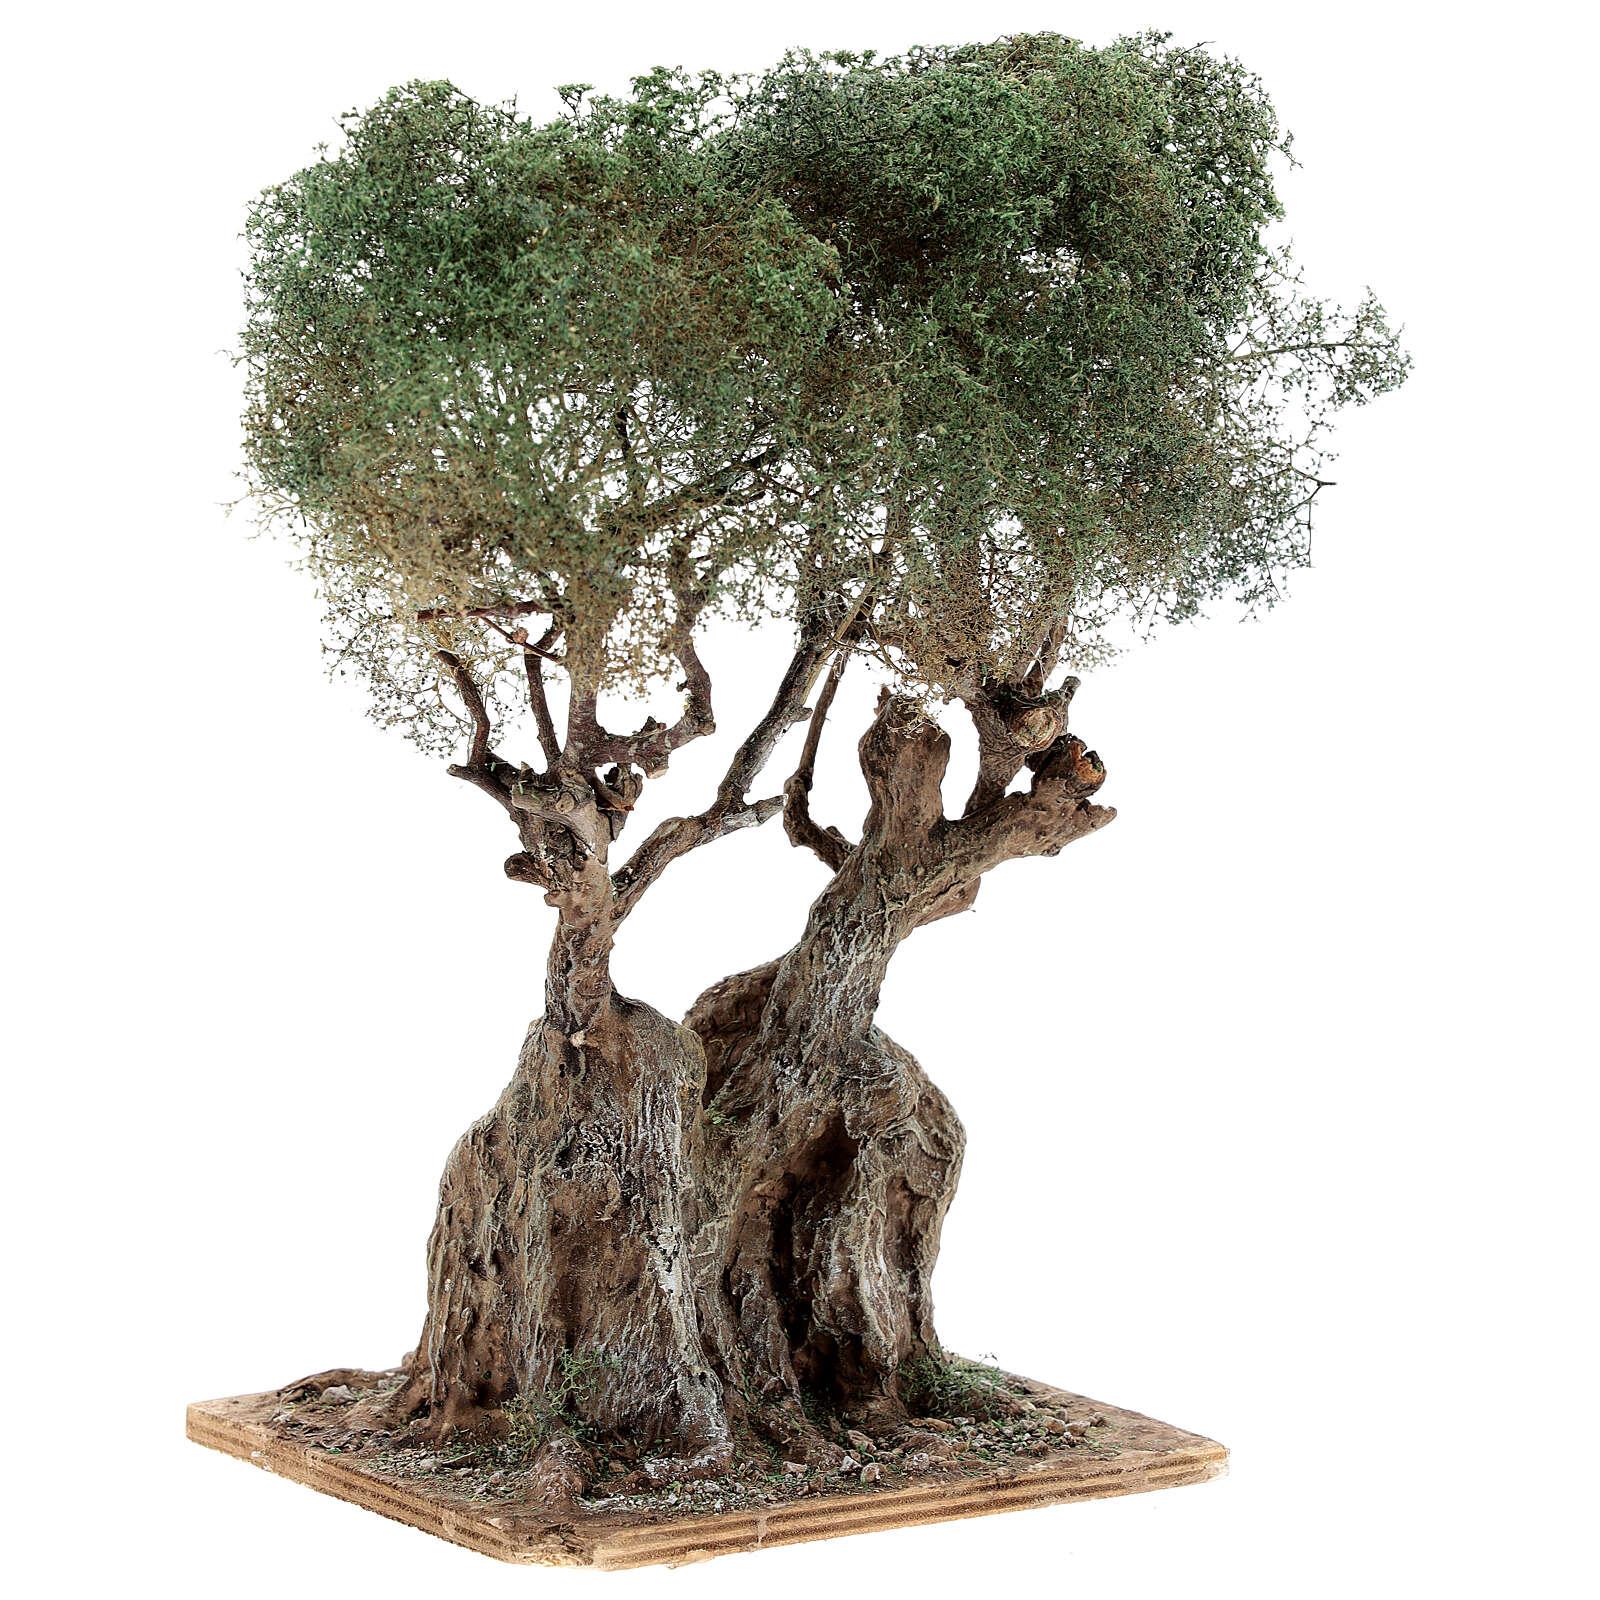 Árbol olivo realista belén napolitano madera cartón piedra h real 20 cm 4